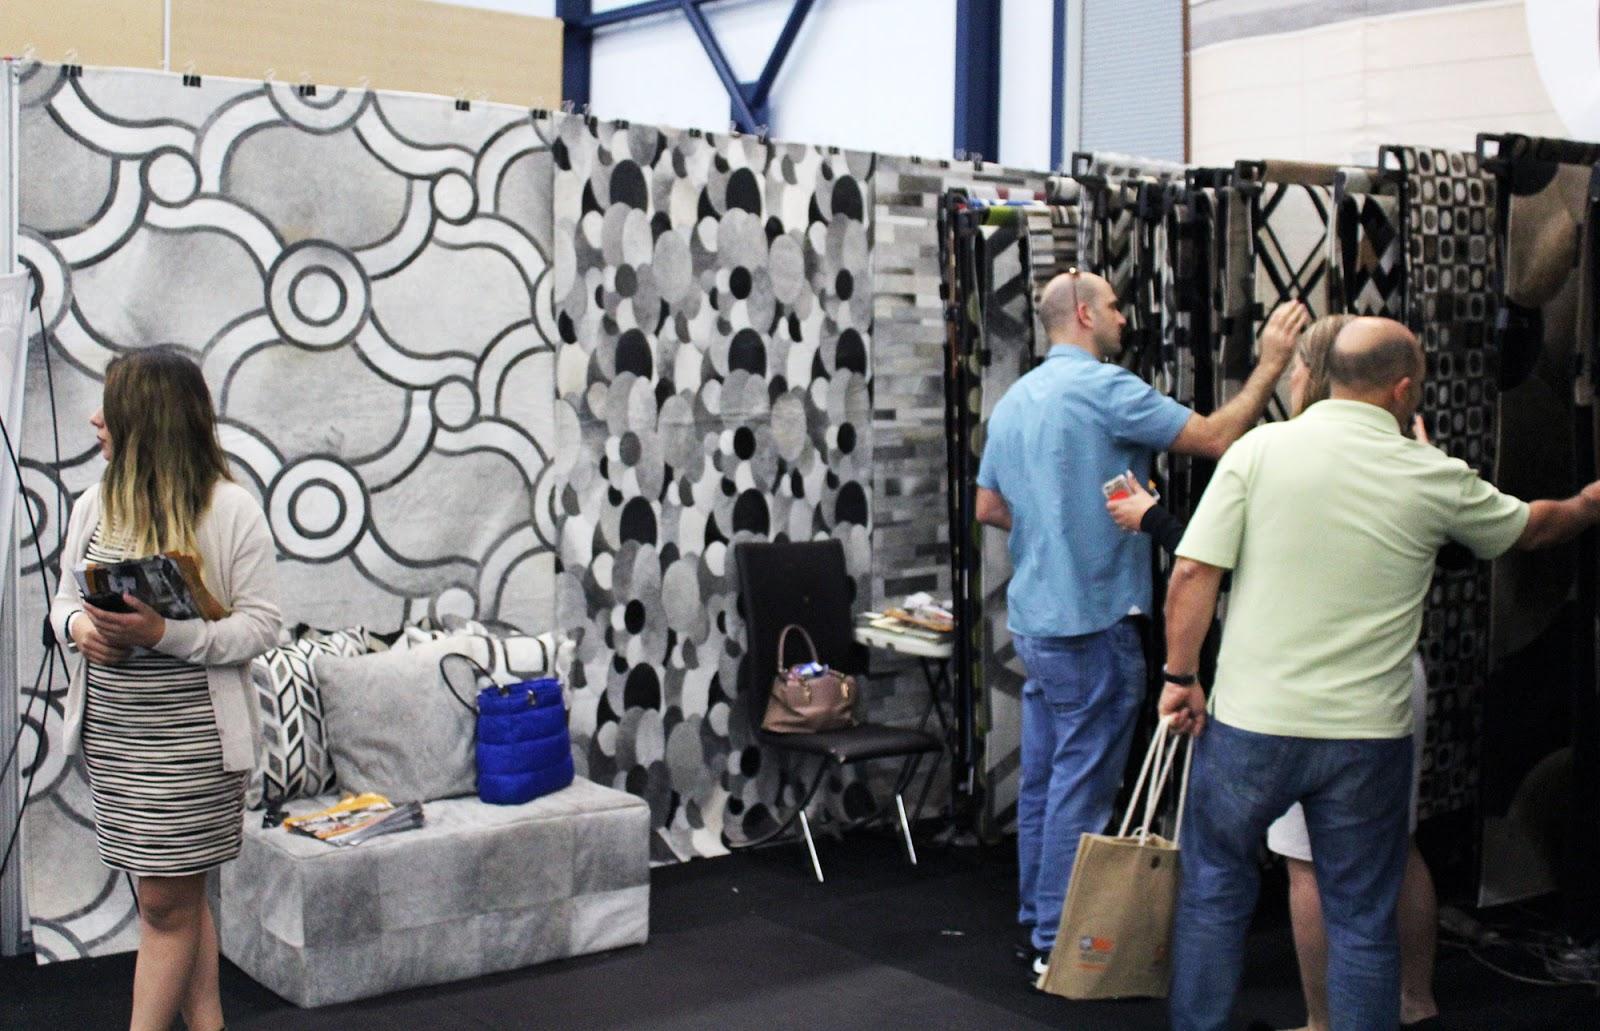 Expo Mueble 2017 Tijuana Baja California M Xico Analizar N La  # Muebles Coloniales Tijuana